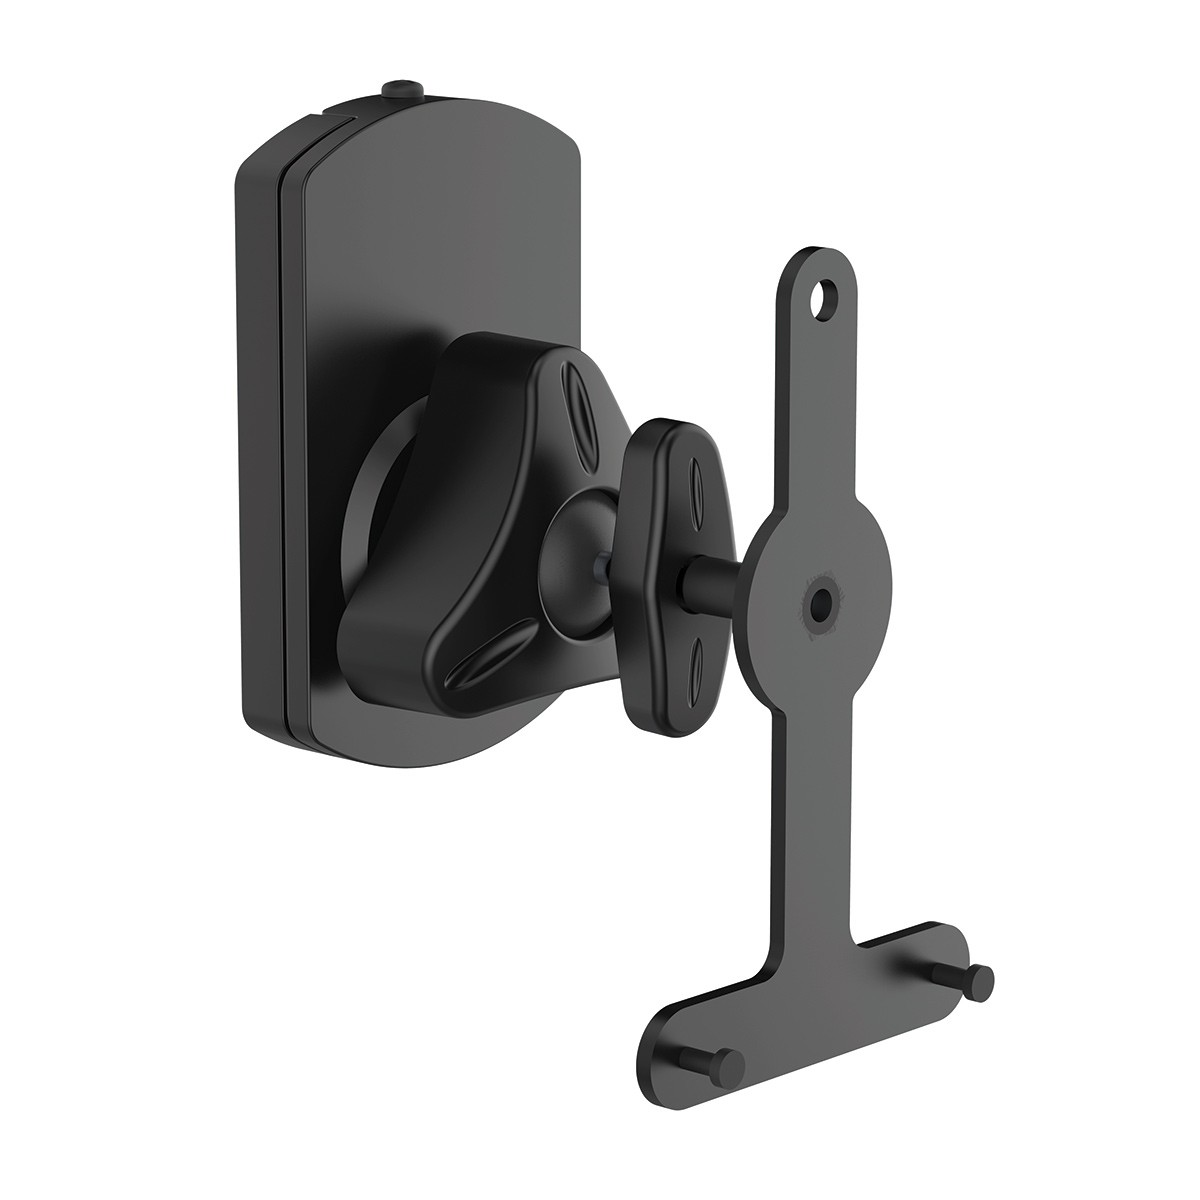 Speaker Wall Bracket/Mount SSB-30 for SONOS Play:1 or Play:3 (Single)